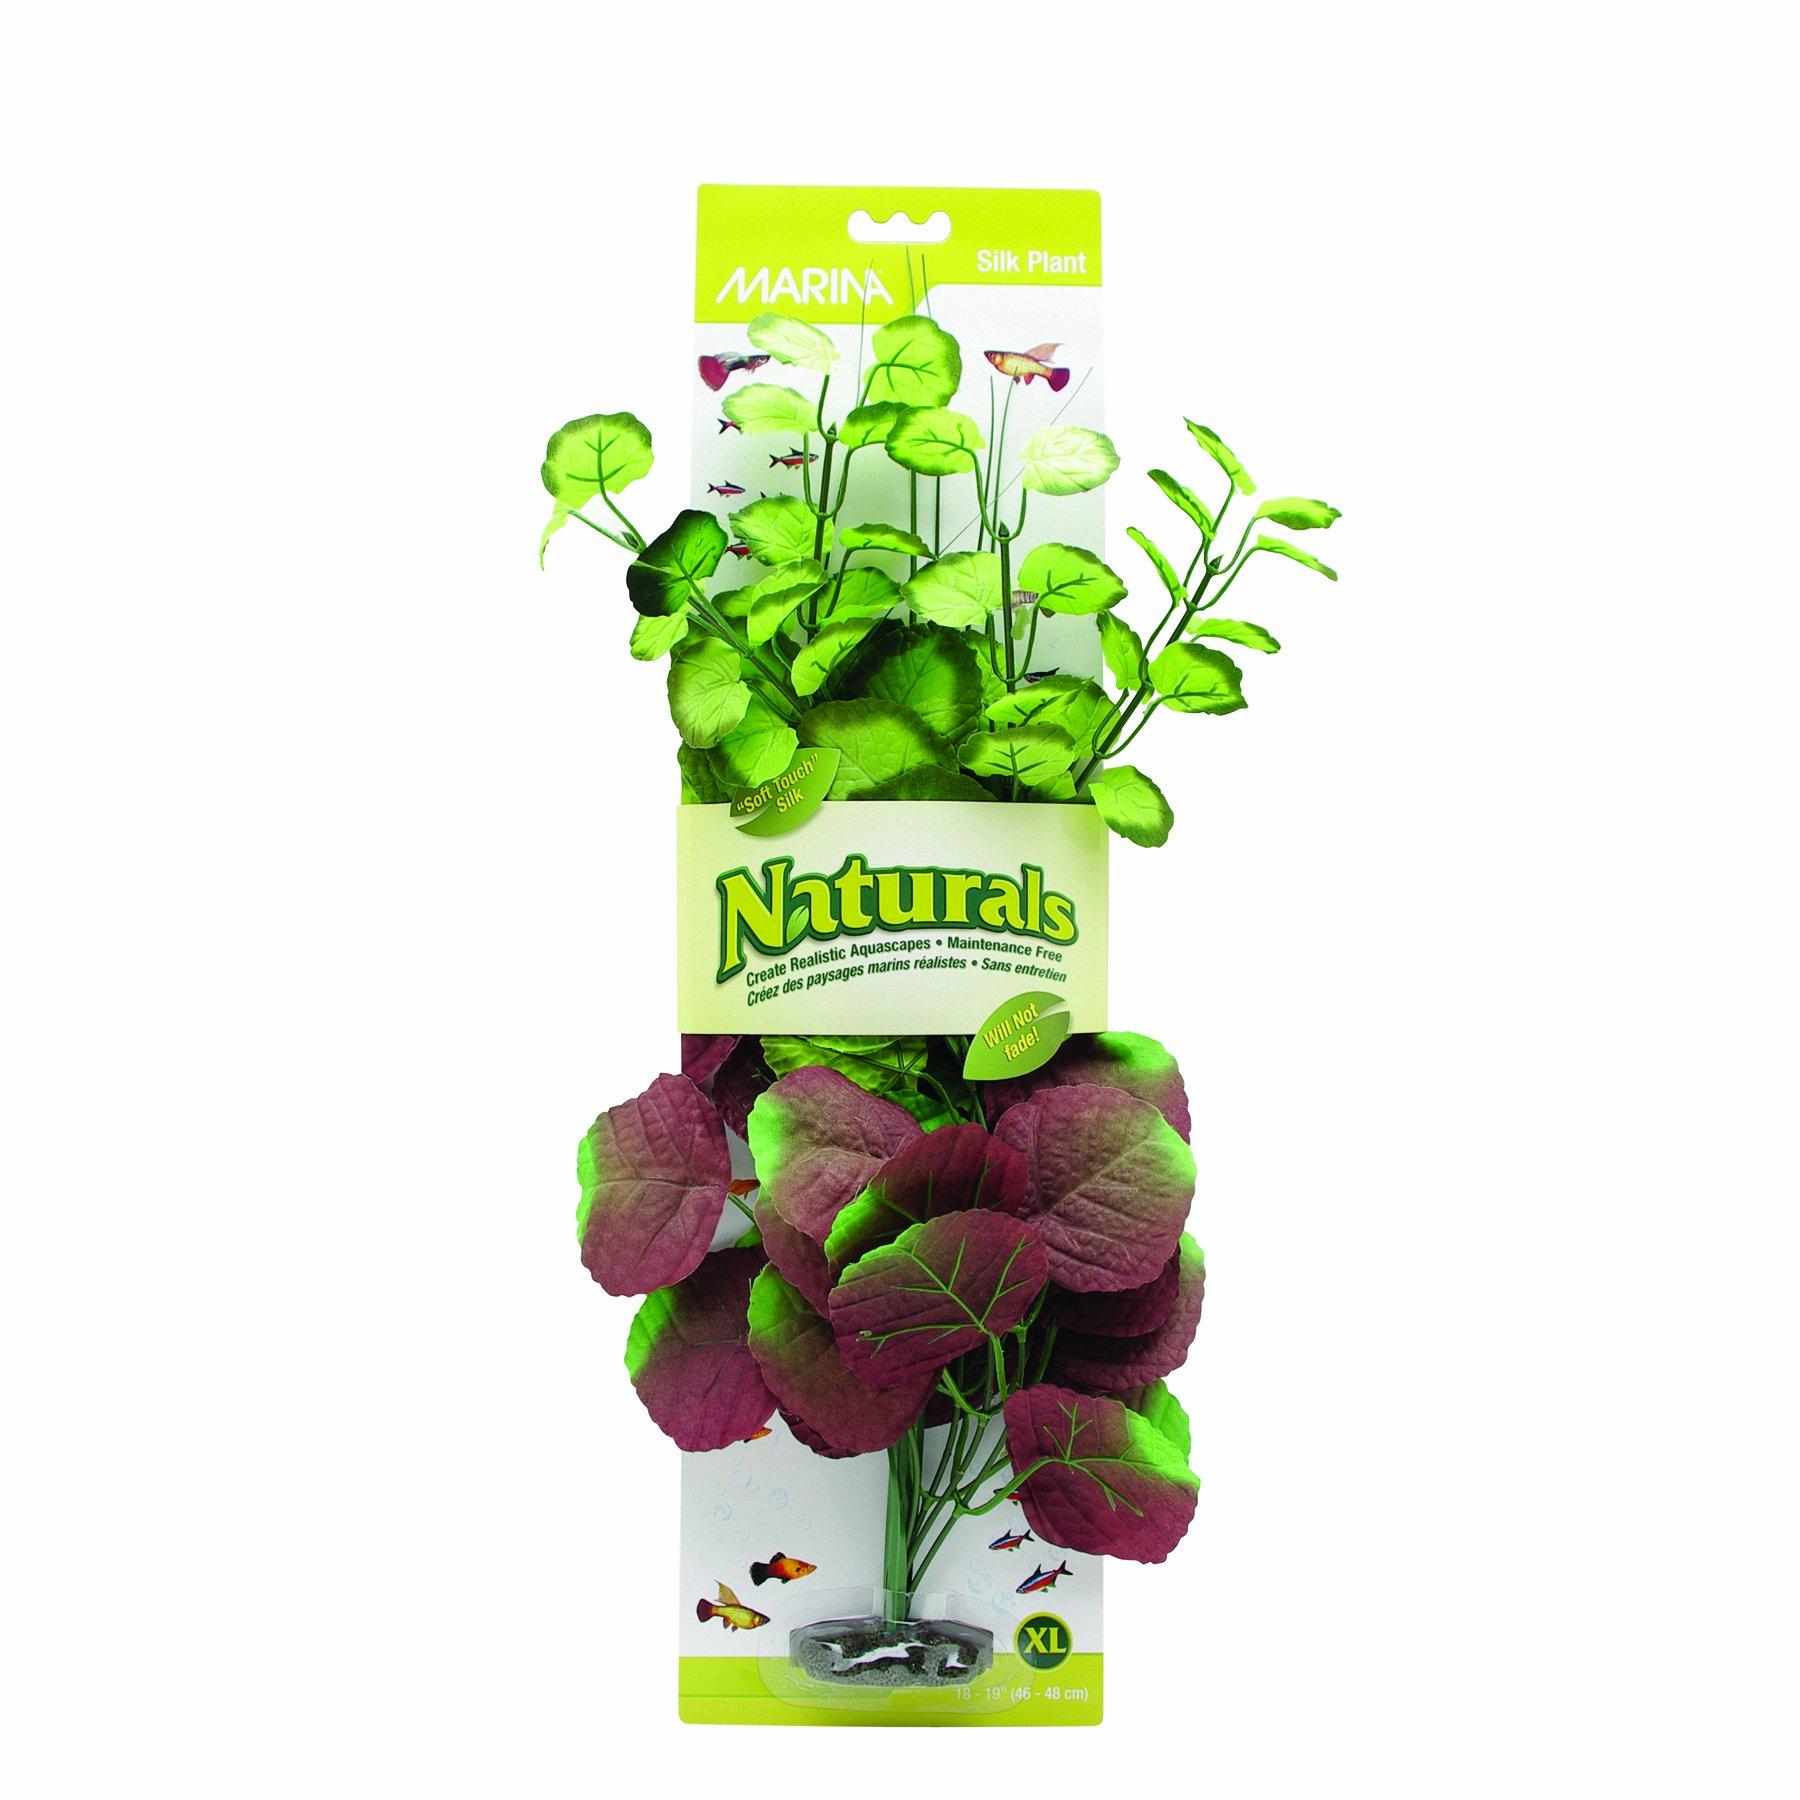 Marina Naturals Pennywort Silk Plant, X-Large by Marina